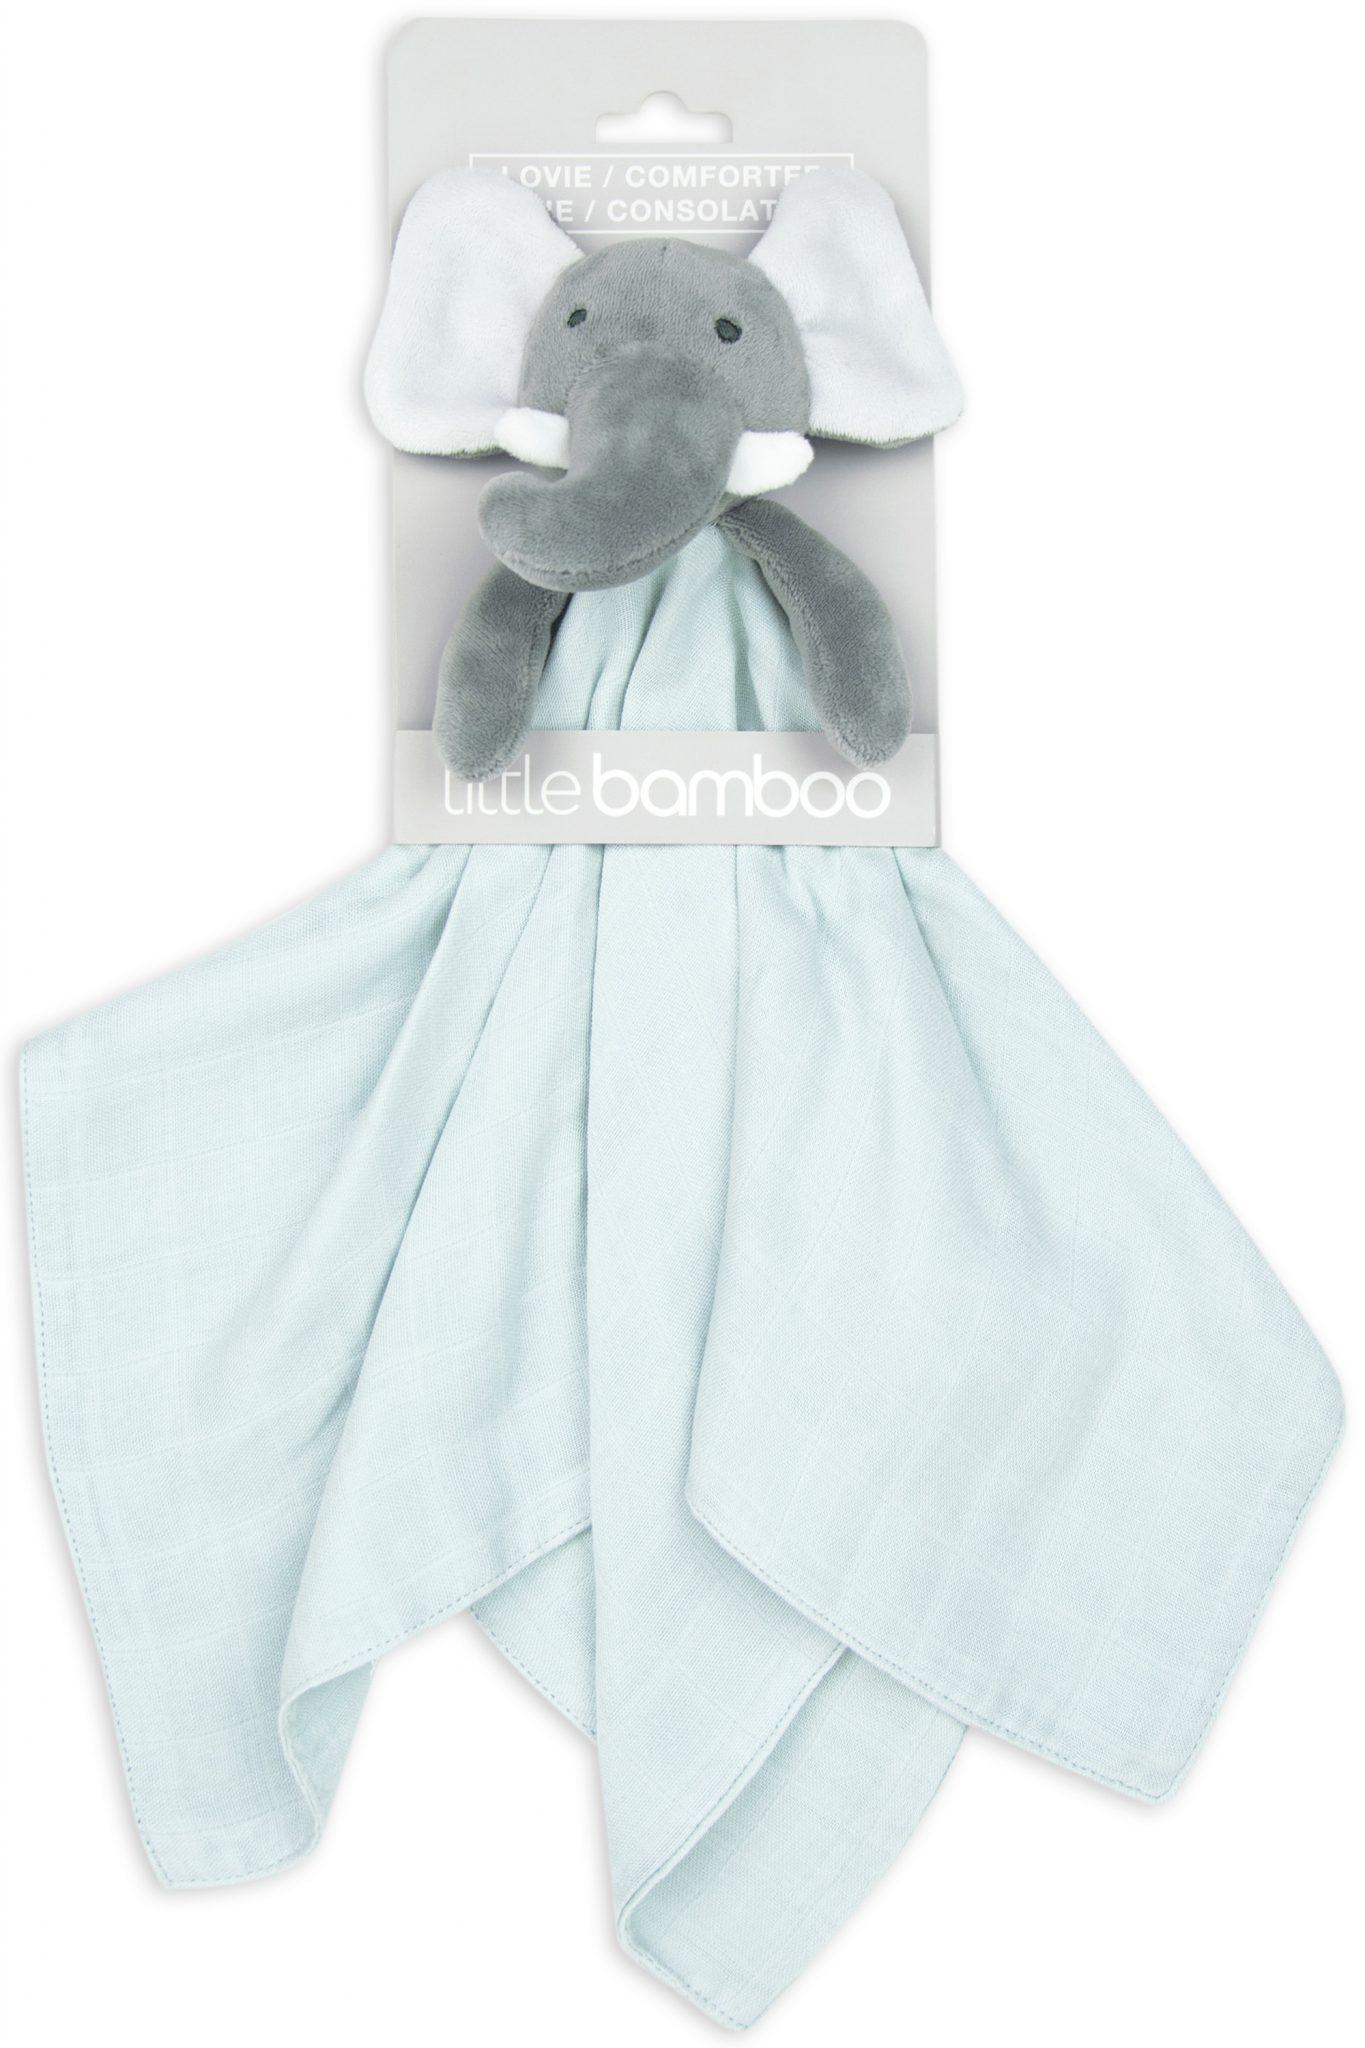 Little bamboo comforter toy for sleep. Grey elephant with bamboo muslin bottom. moonlight baby sleep melbourne